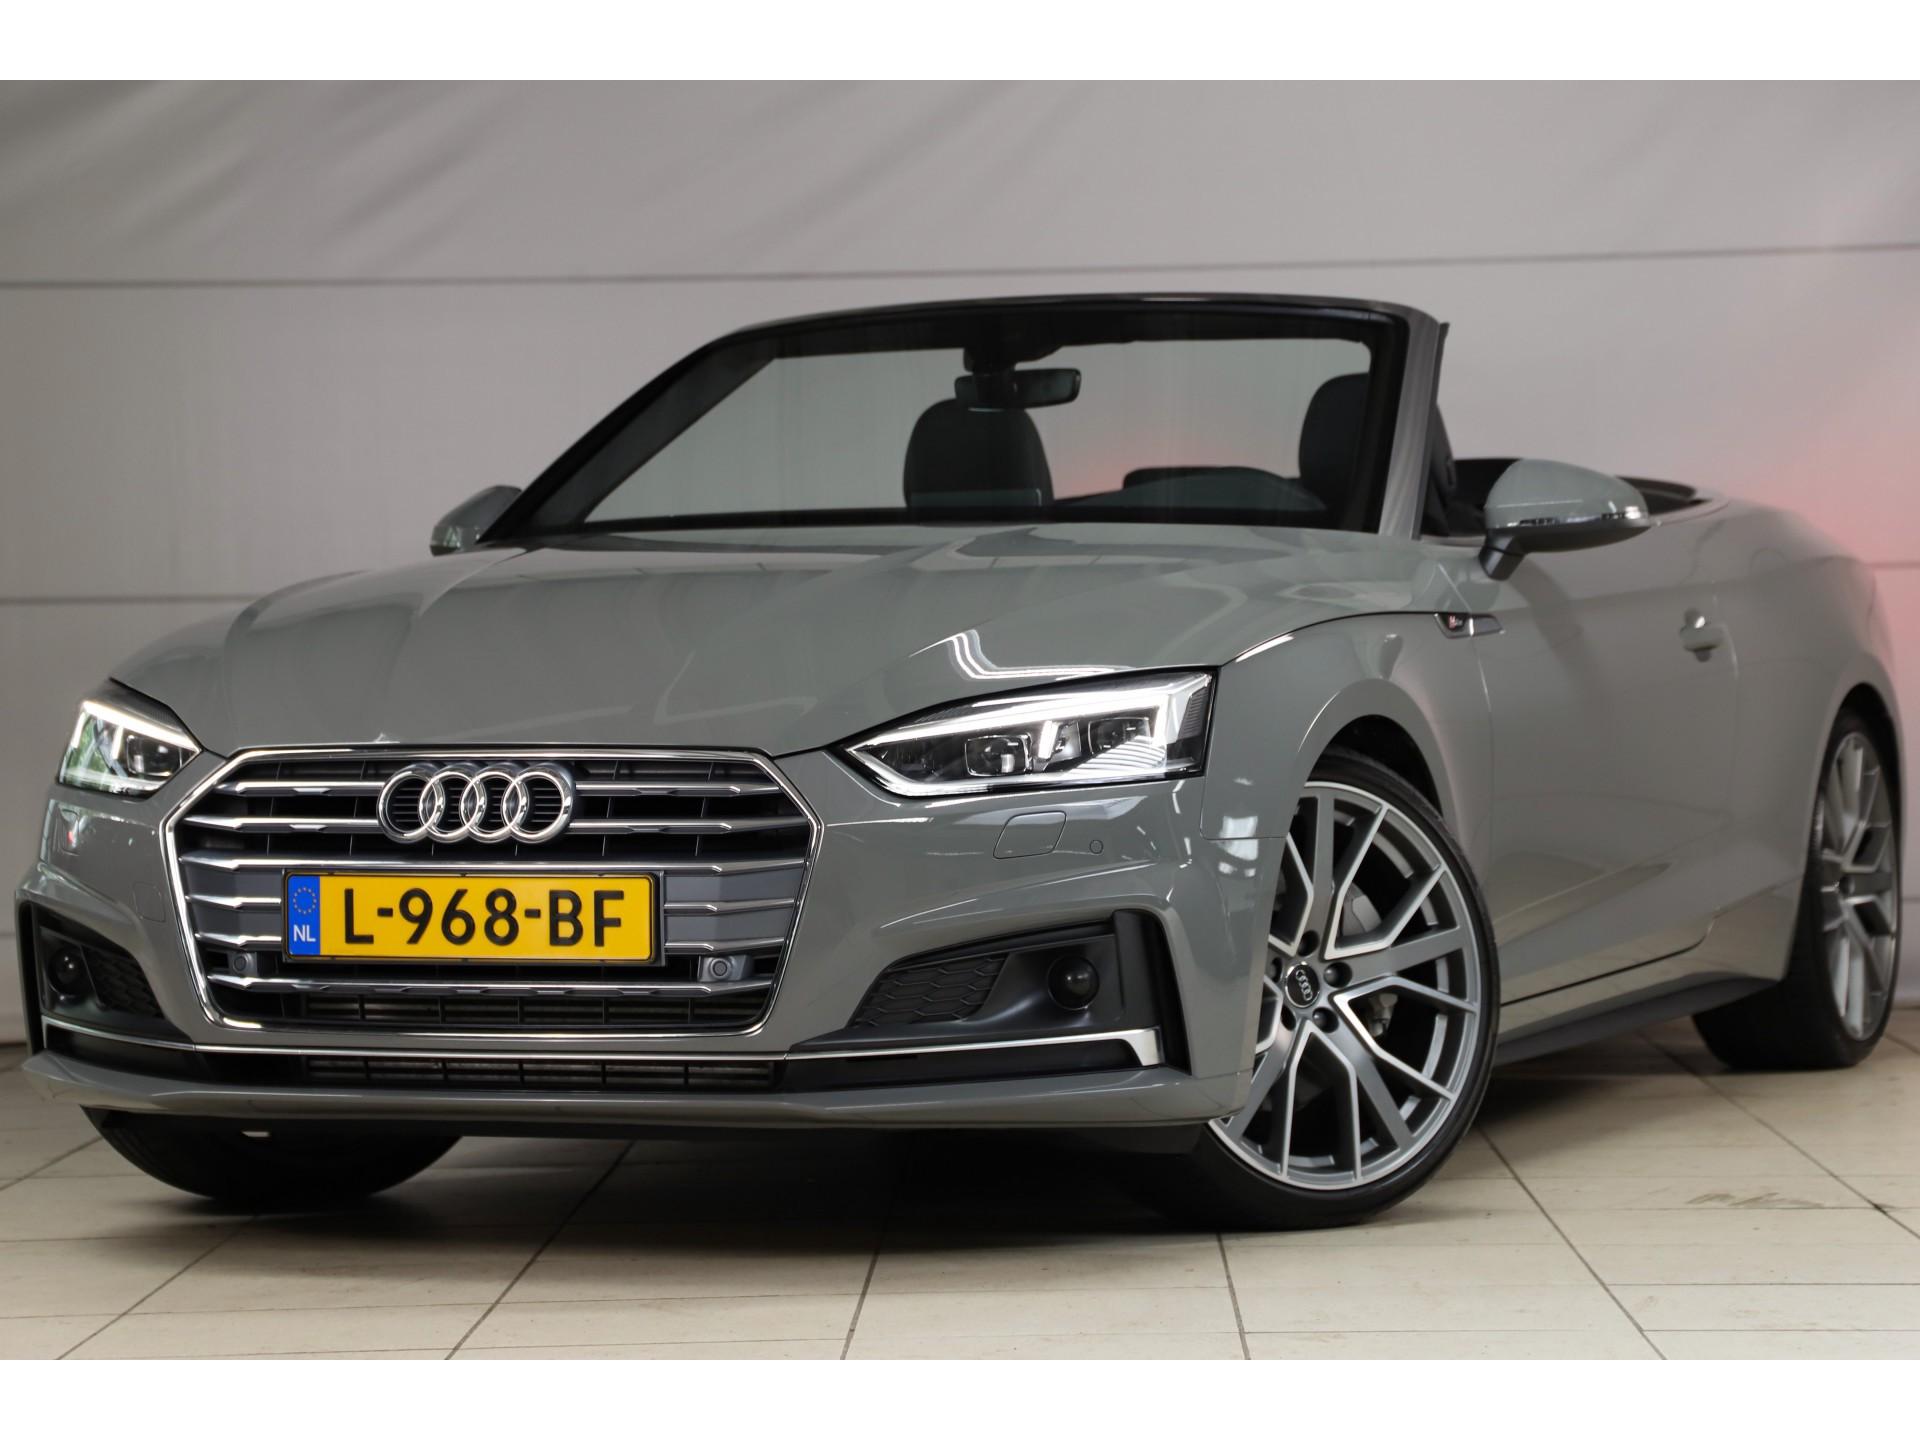 Audi - A5 Cabriolet 45 245pkTFSI Sport S Line Edition - 2019